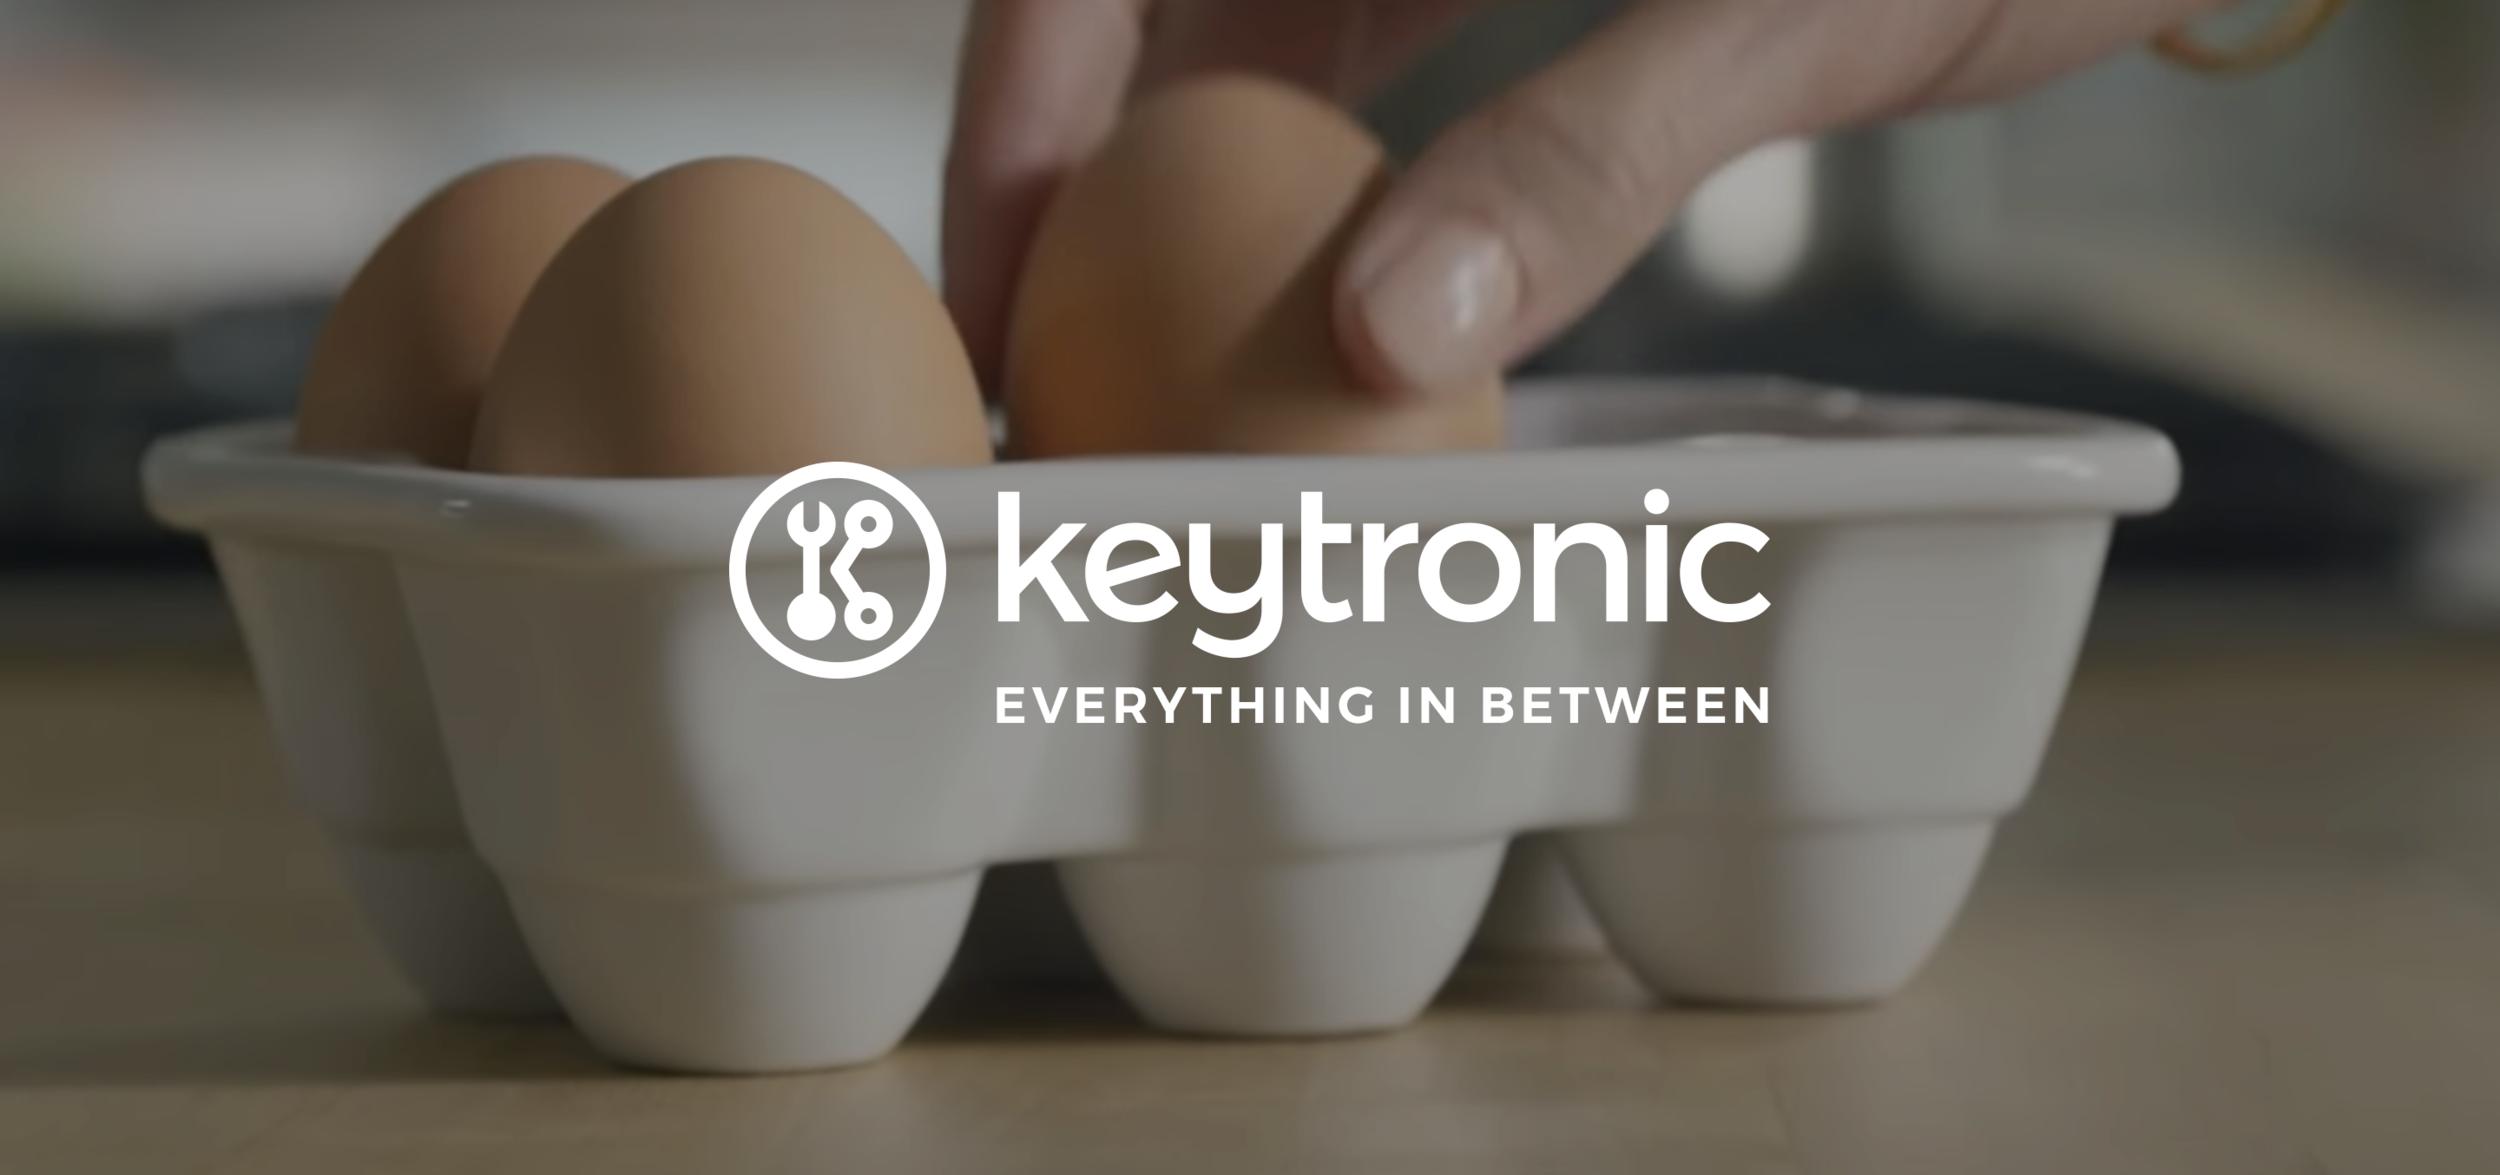 Keytronic_50Years-WhereWereGoing3.png